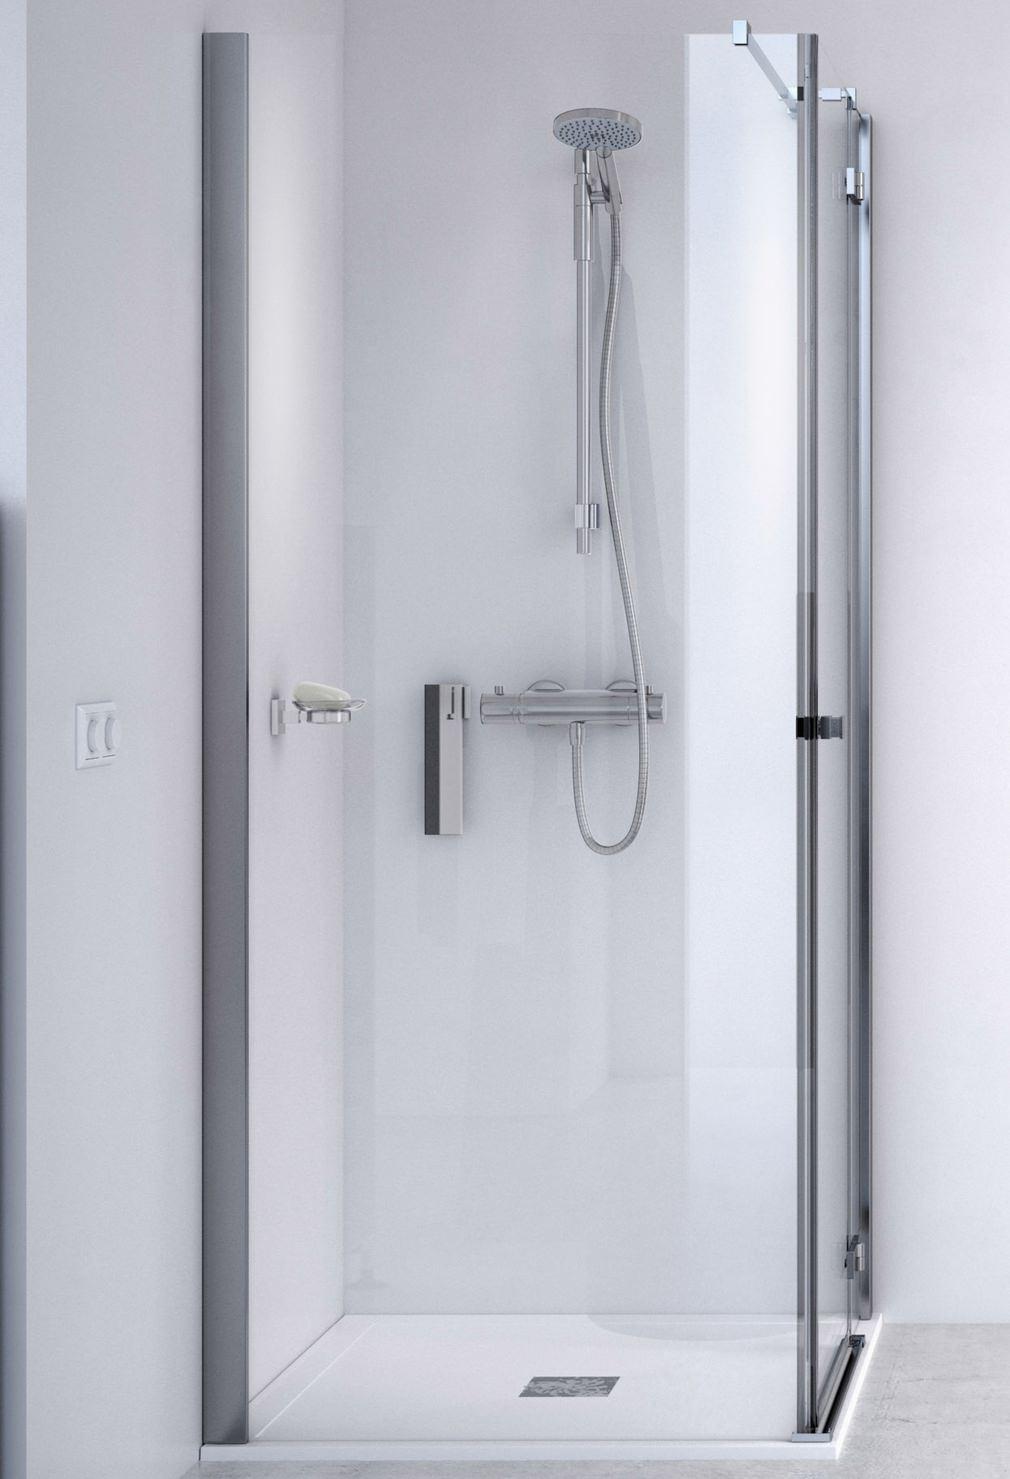 Aqualux id match square 1000 x 1000mm hinge door with side for 1000 pivot shower door